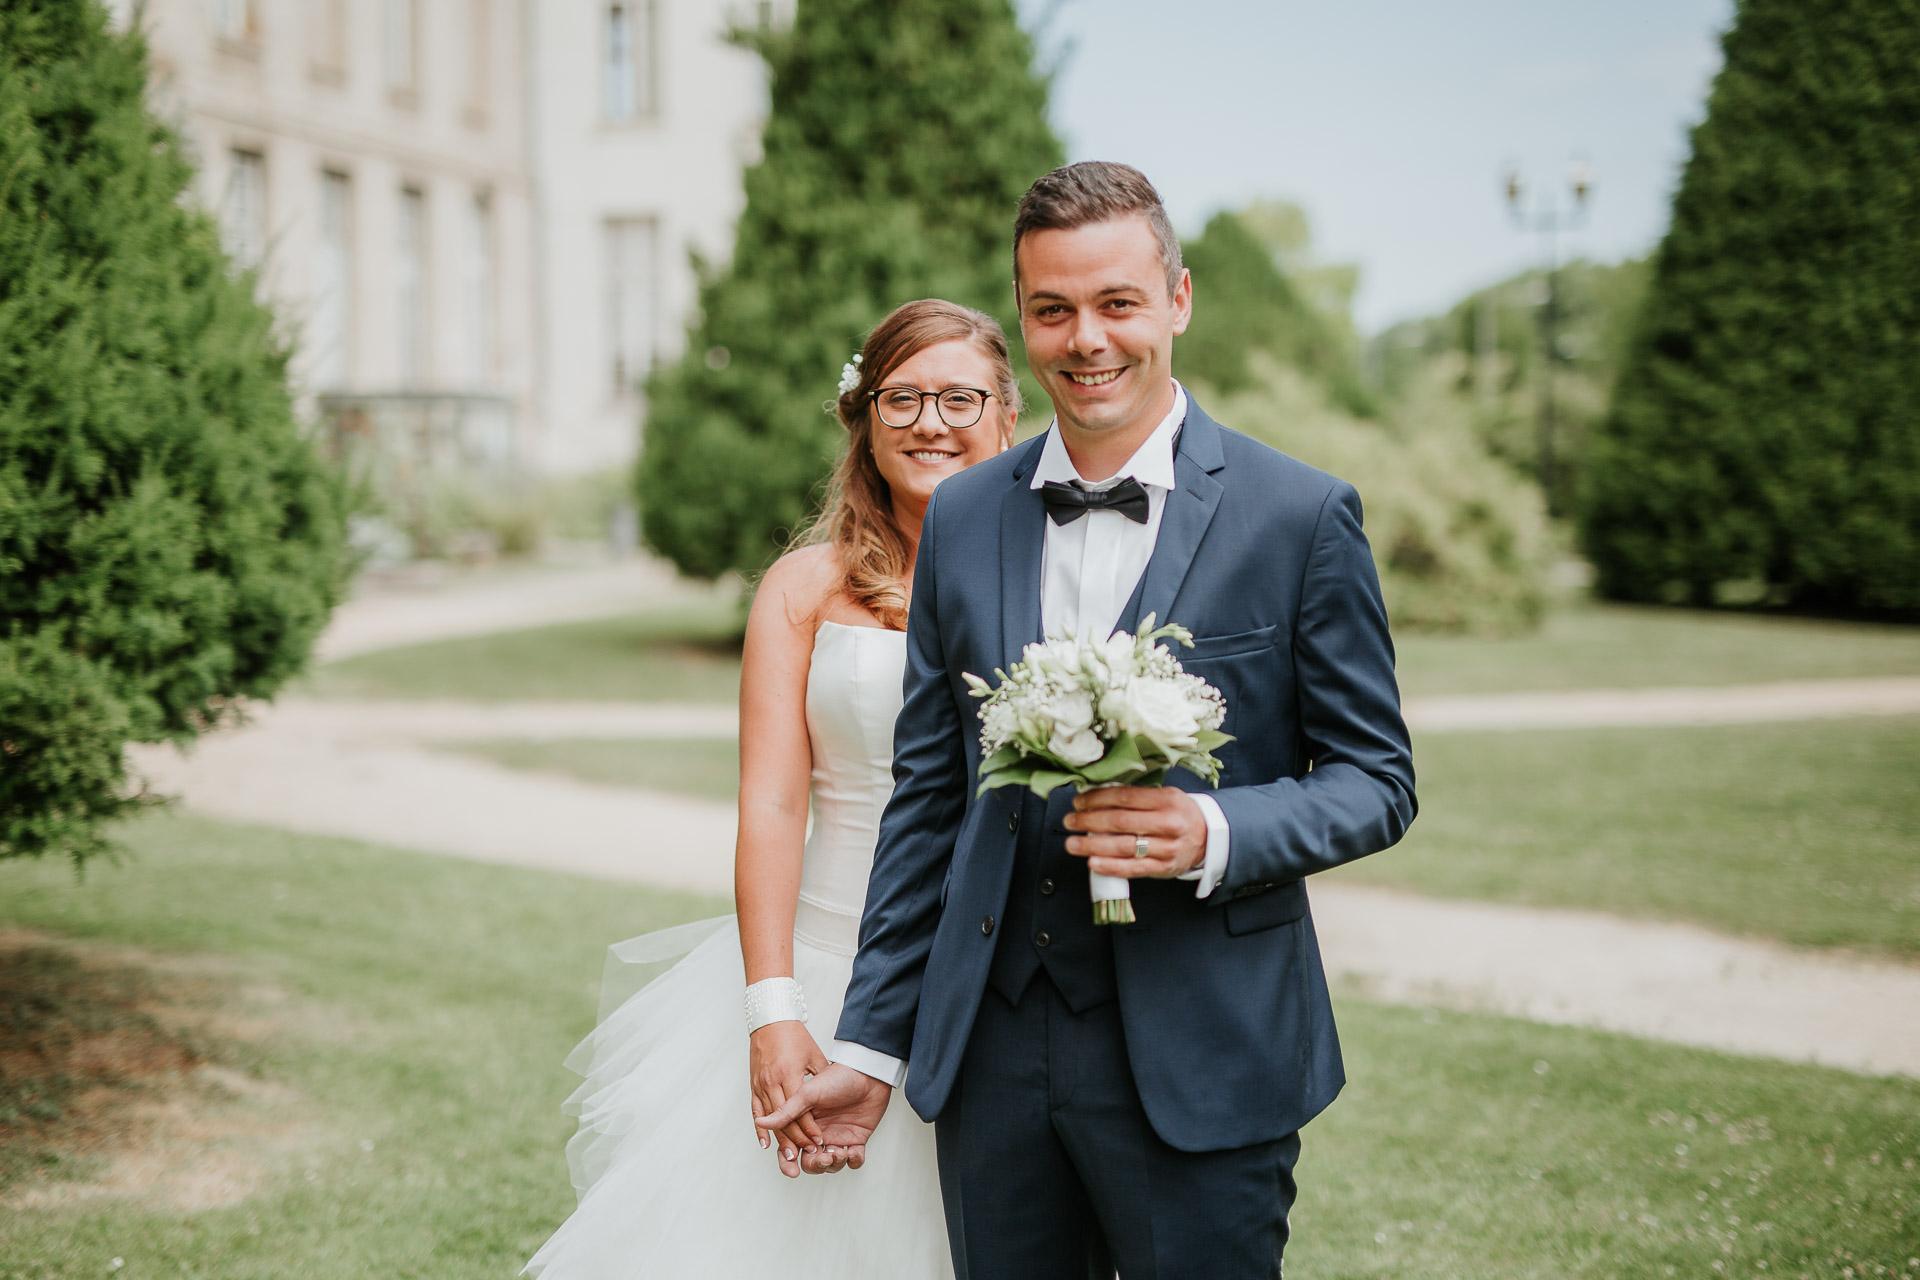 photographe de mariage aisne oise